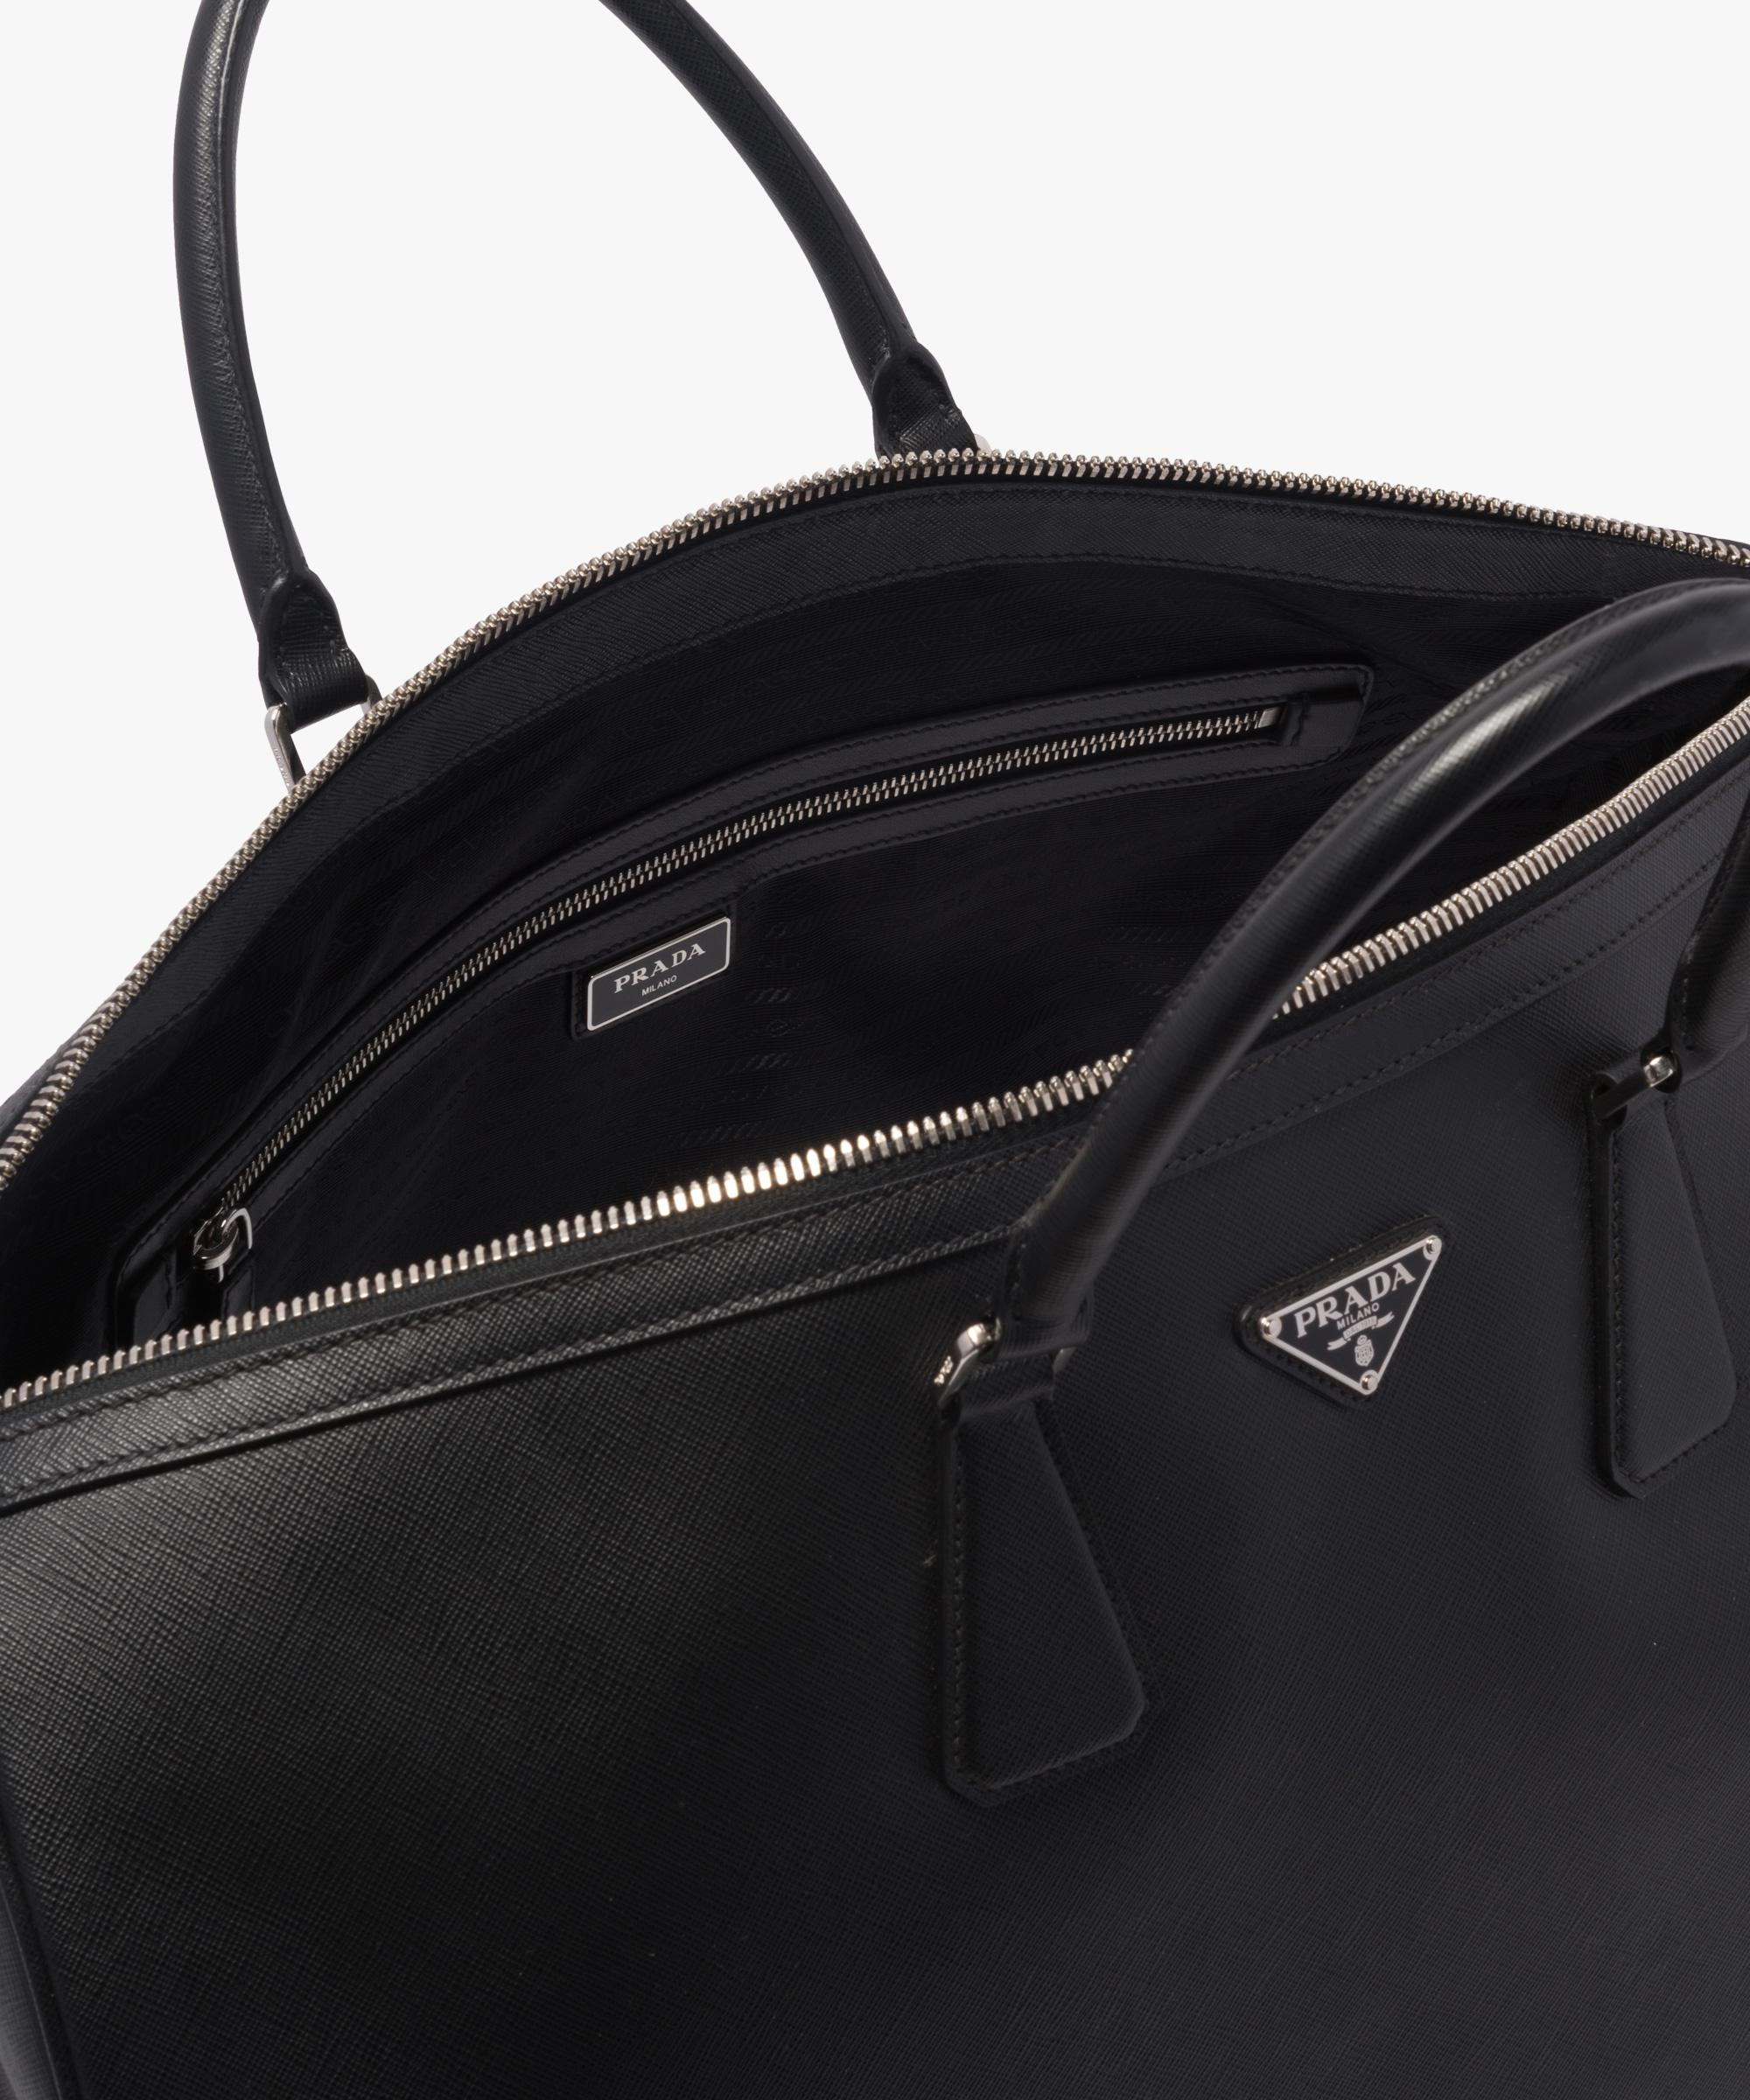 22214ccd2343 Lyst - Prada Saffiano Leather Travel Bag in Black for Men